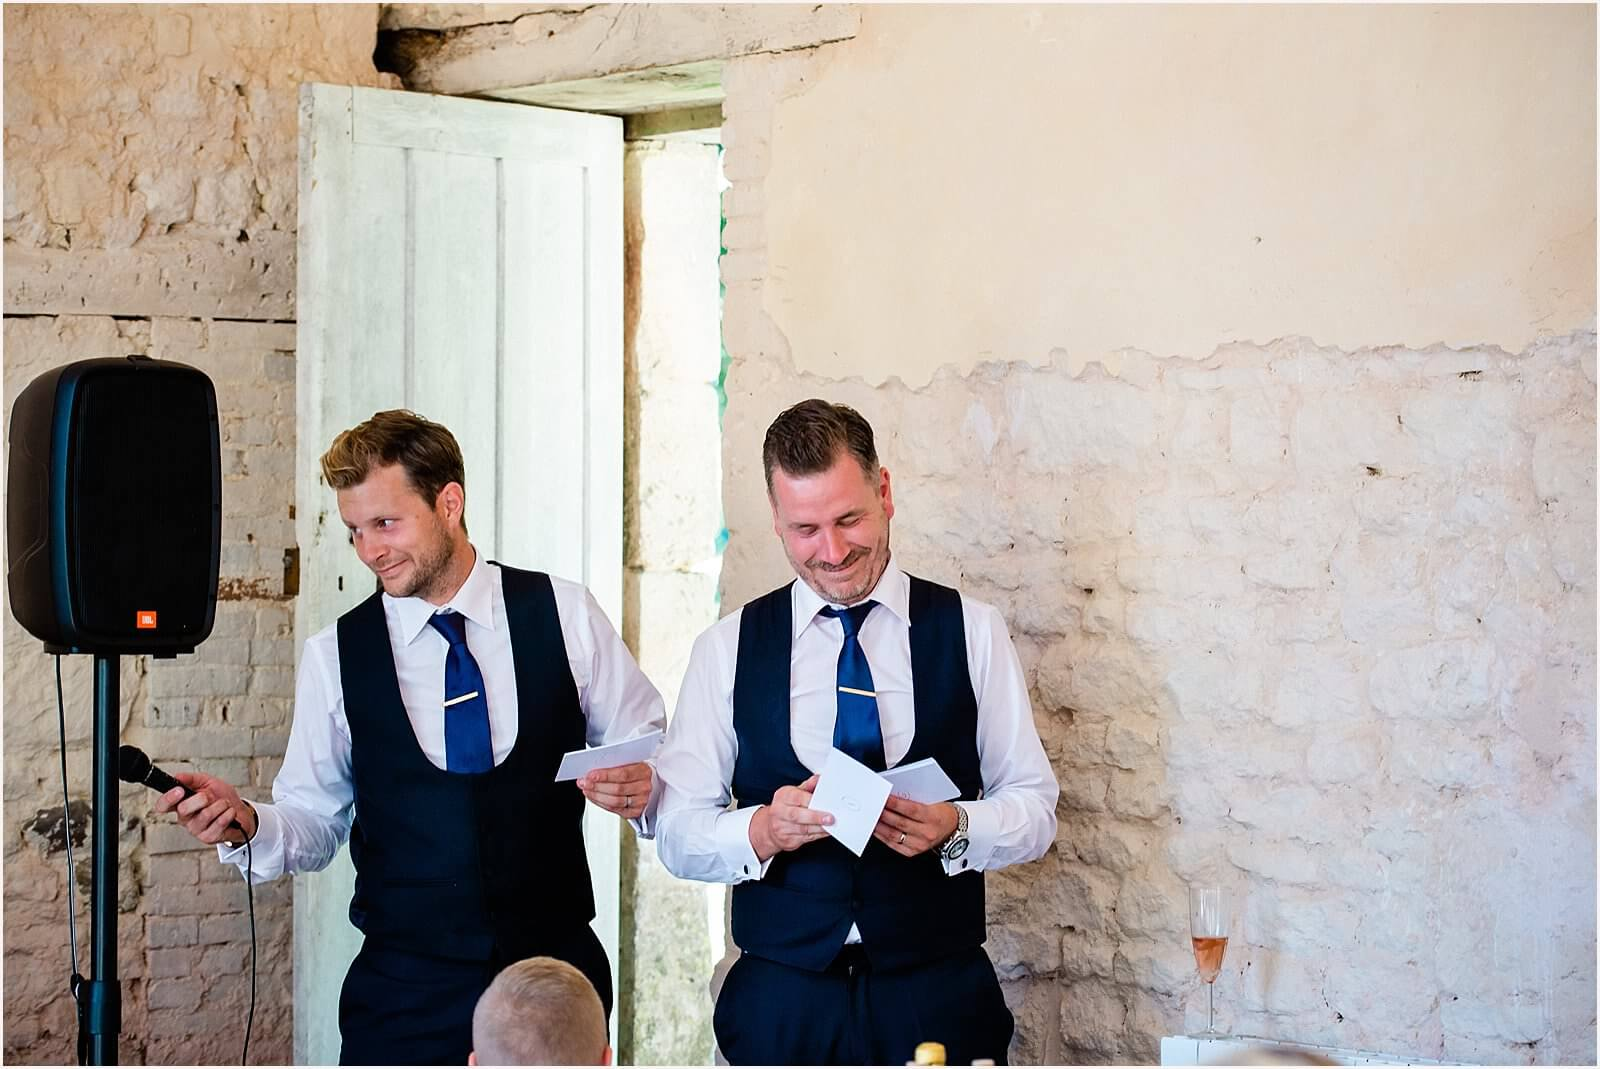 Chateau de Courtomer Wedding | Chantel & Evan 49